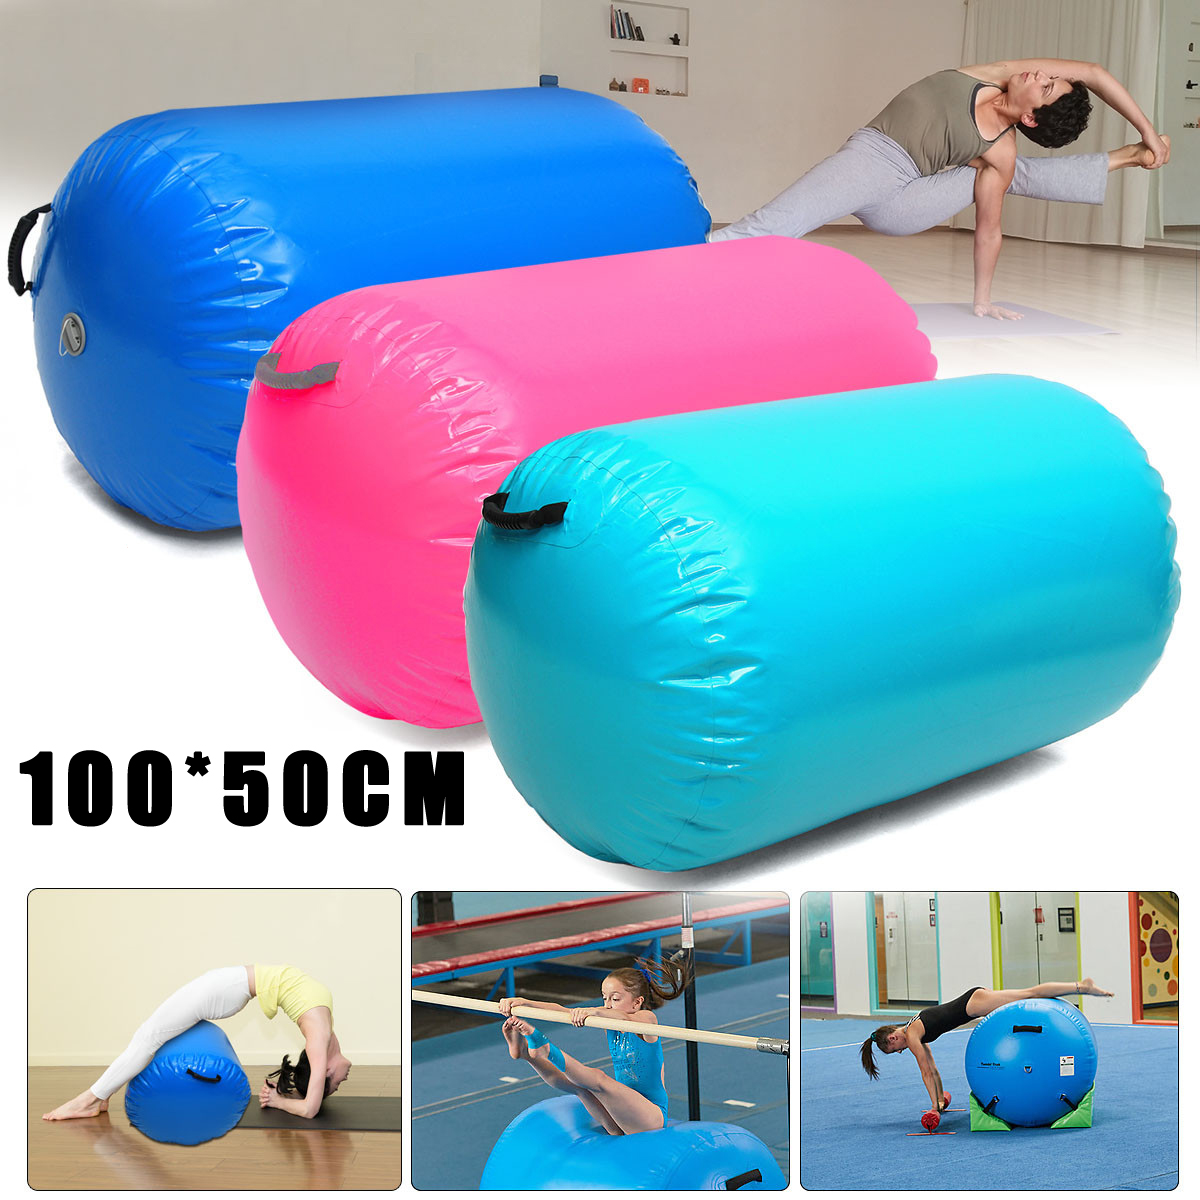 SGODDE 1Pcs 100x50cm Inflatable Custom Made Pvc Gymnastics Gym Air Mat Fitness Body Building Gymnastics Track Roller Mat Tools